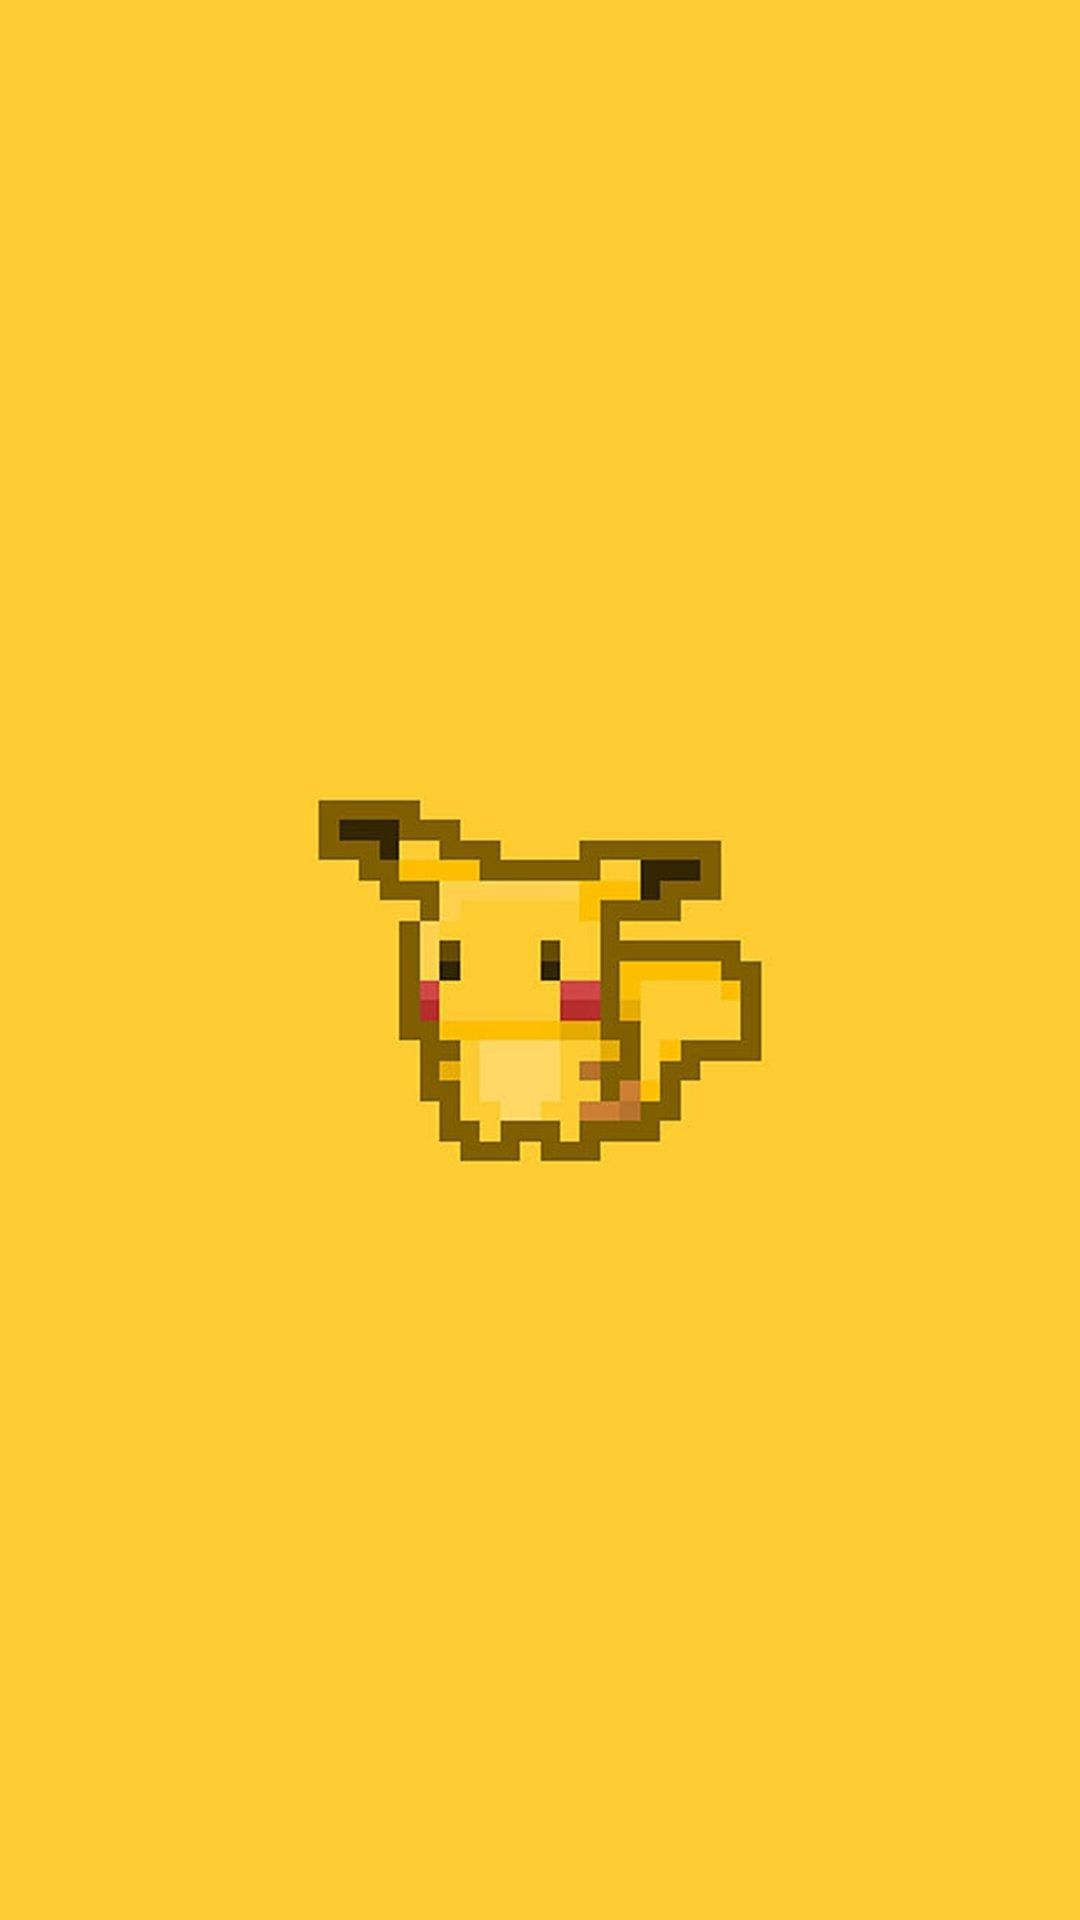 Yellow Pokemon Iphone Wallpapers Top Free Yellow Pokemon Iphone Backgrounds Wallpaperaccess